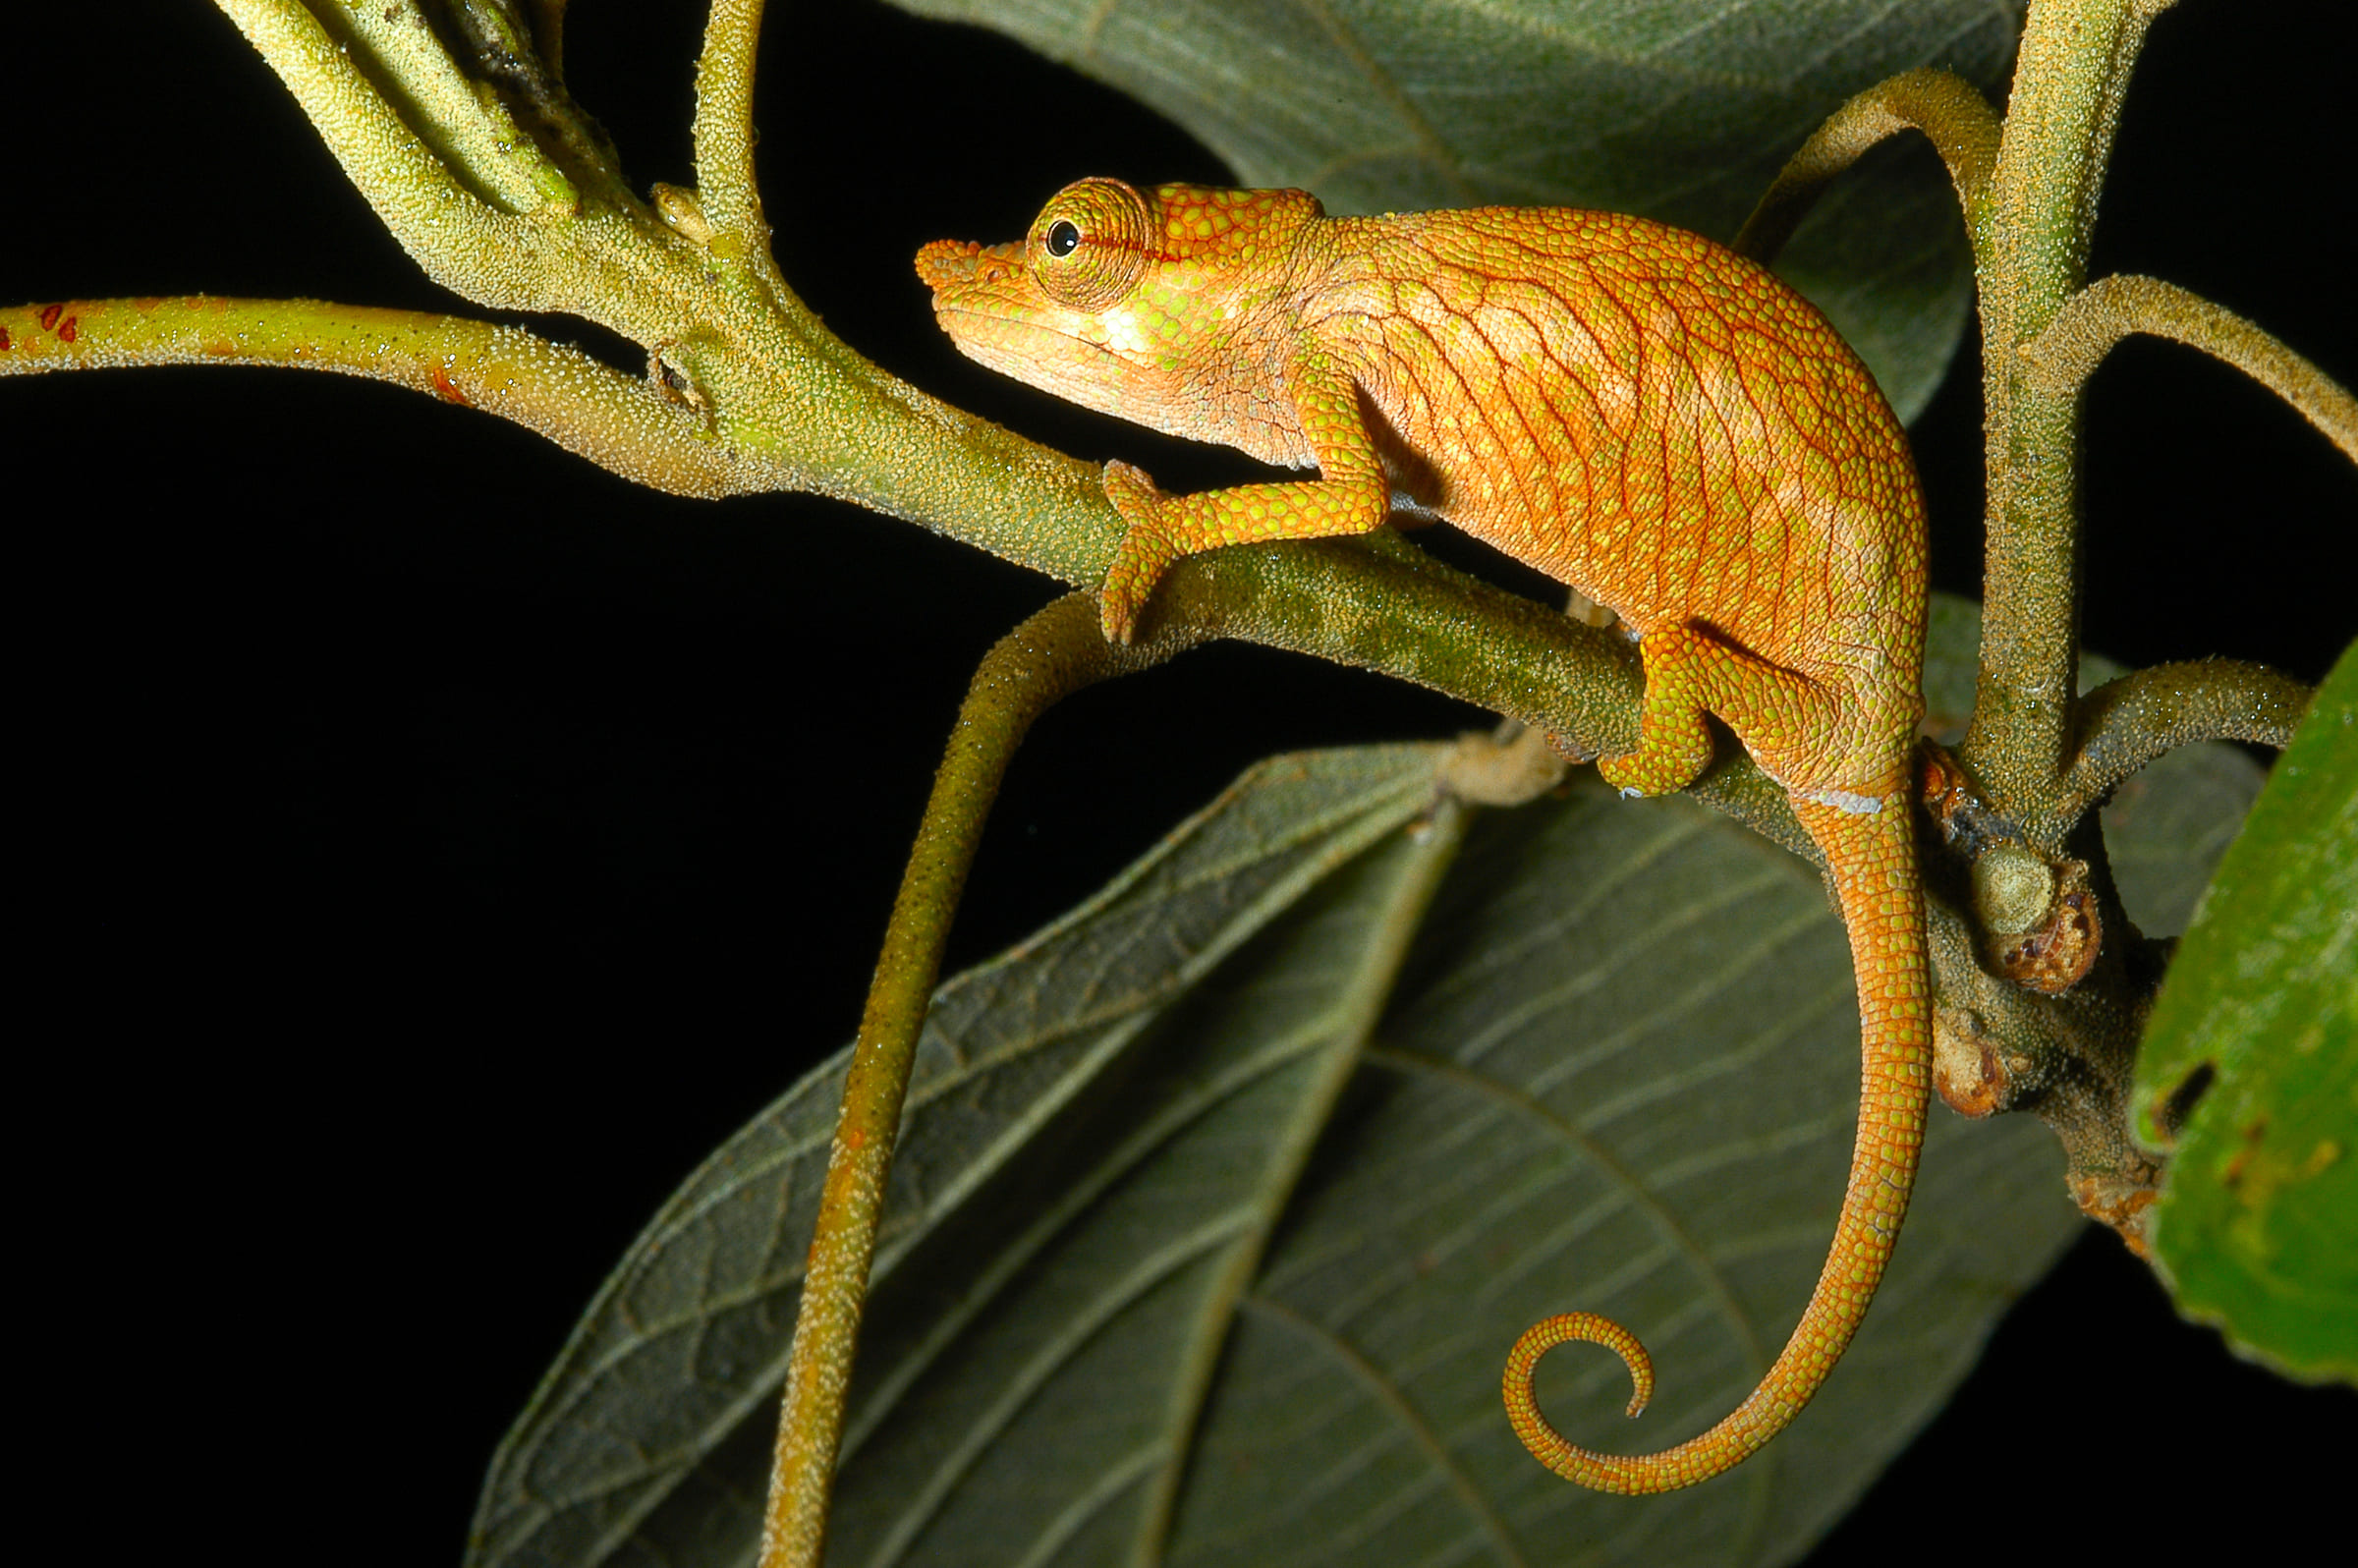 Un piccolo camaleonte giallo (Calumma nasutum)